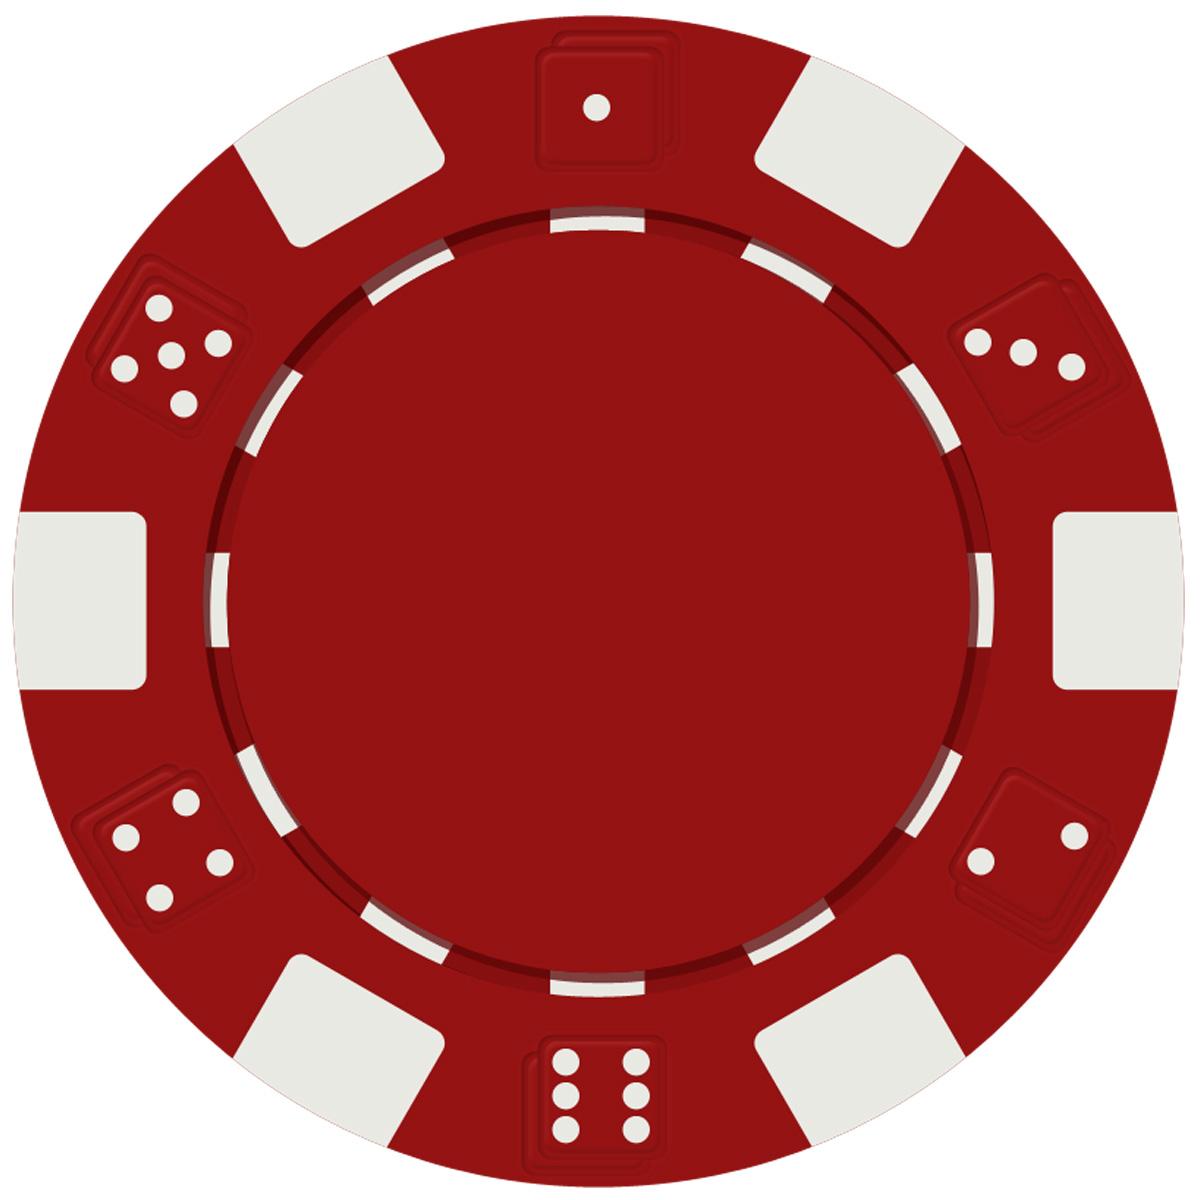 Casino clipart poker run. Pcd dice style chip